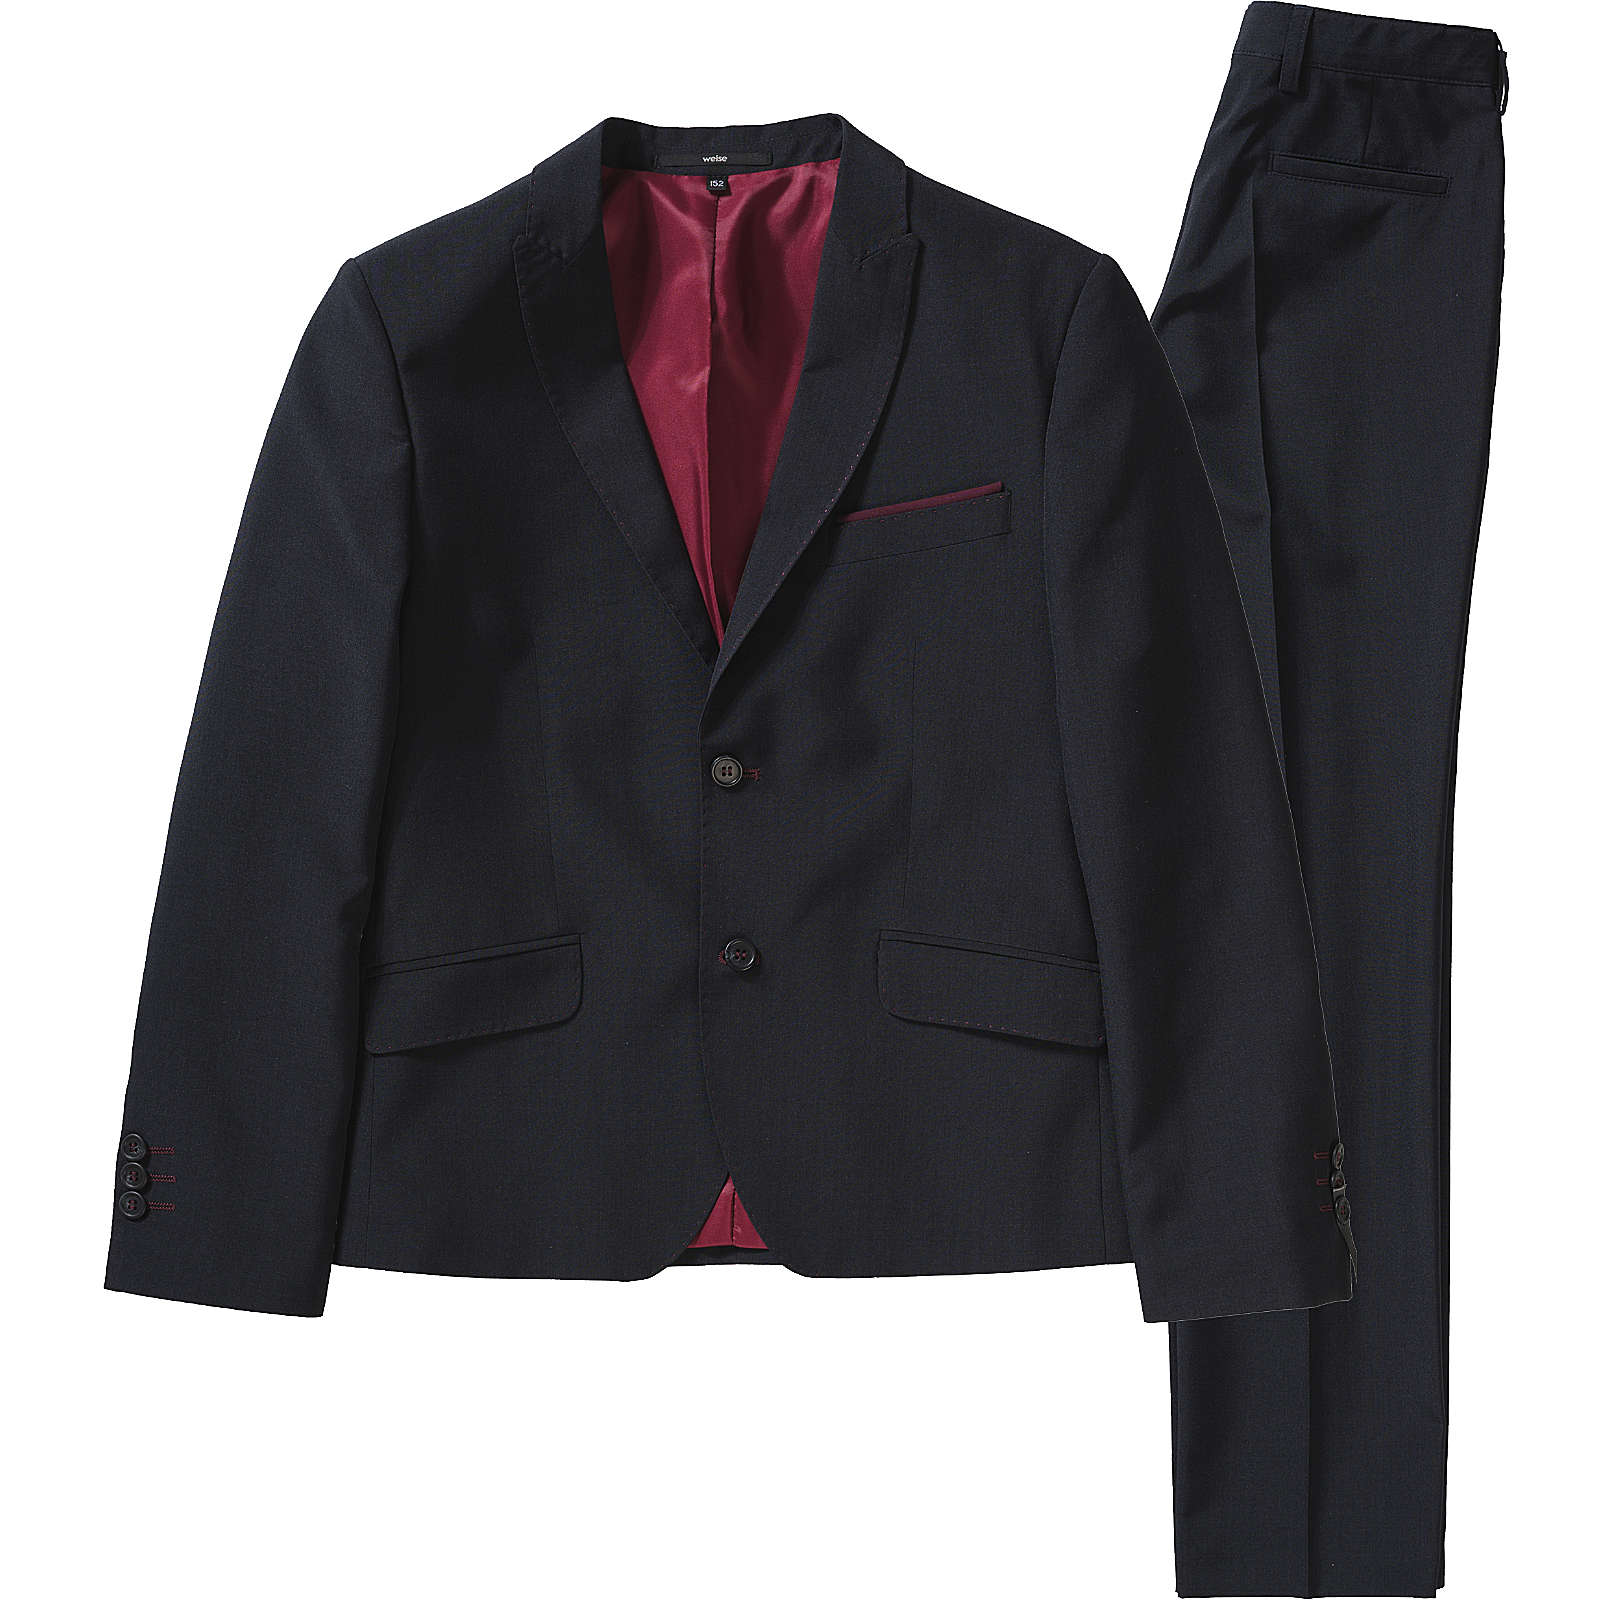 Weise Kinder Anzug, Slim Fit dunkelblau Junge Gr. 152